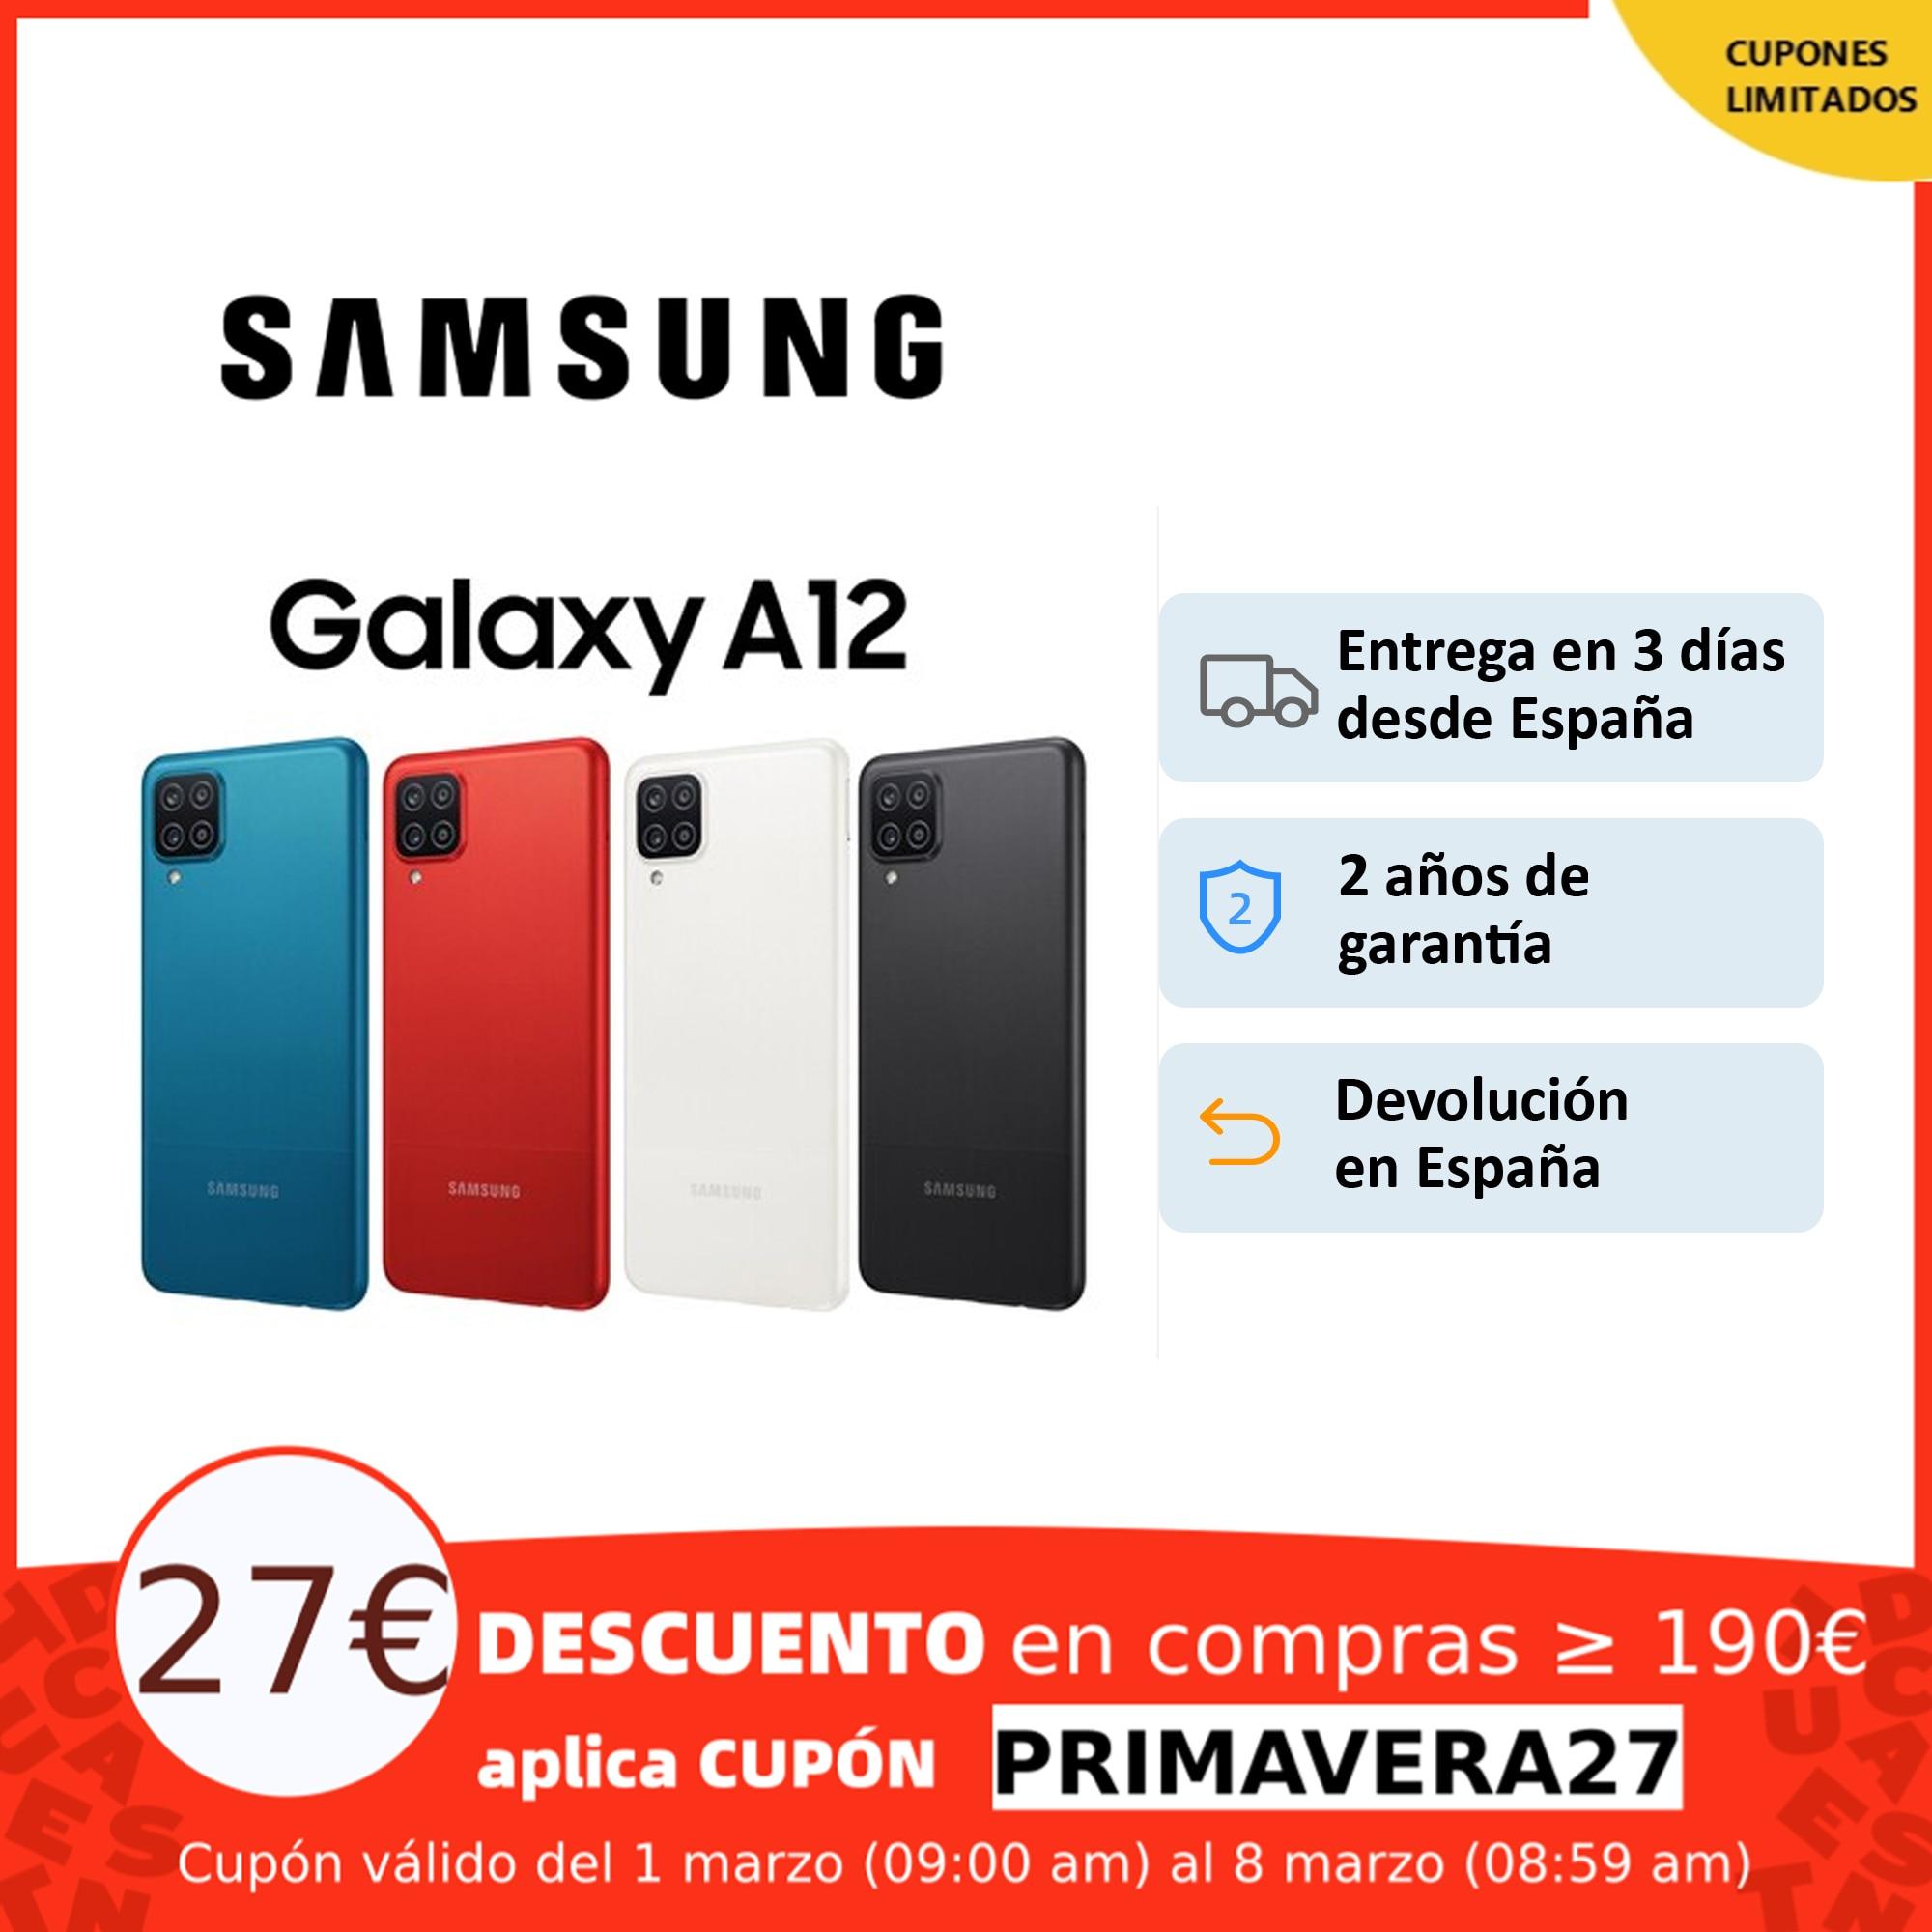 Samsung Galaxy A12, Smartphone HD+ LCD 6.5